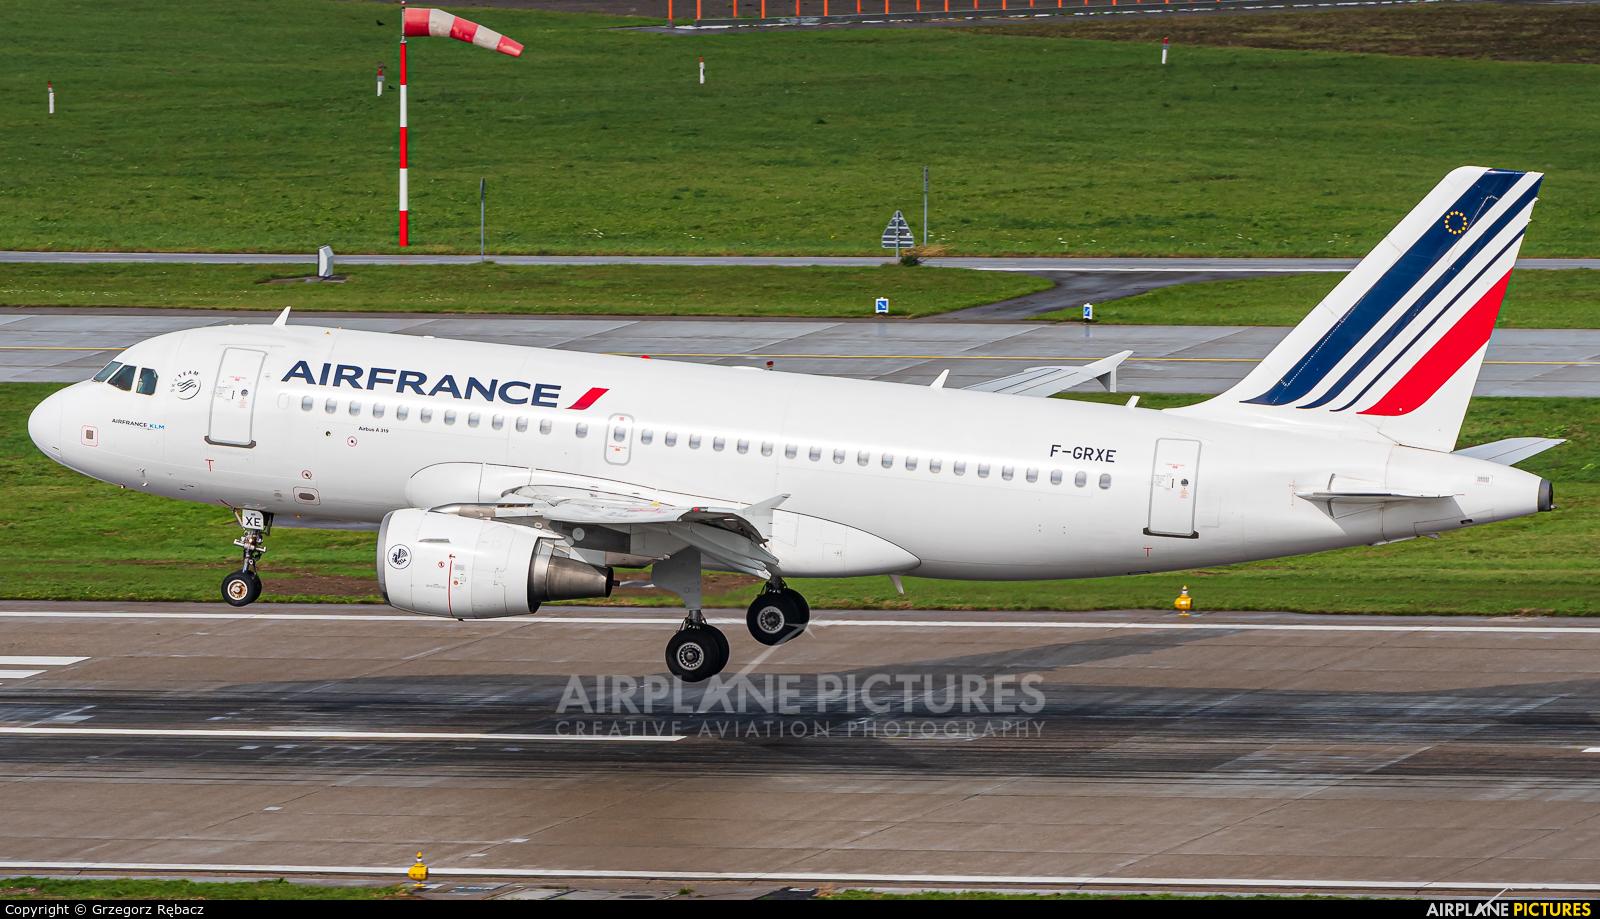 Air France F-GRXE aircraft at Zurich